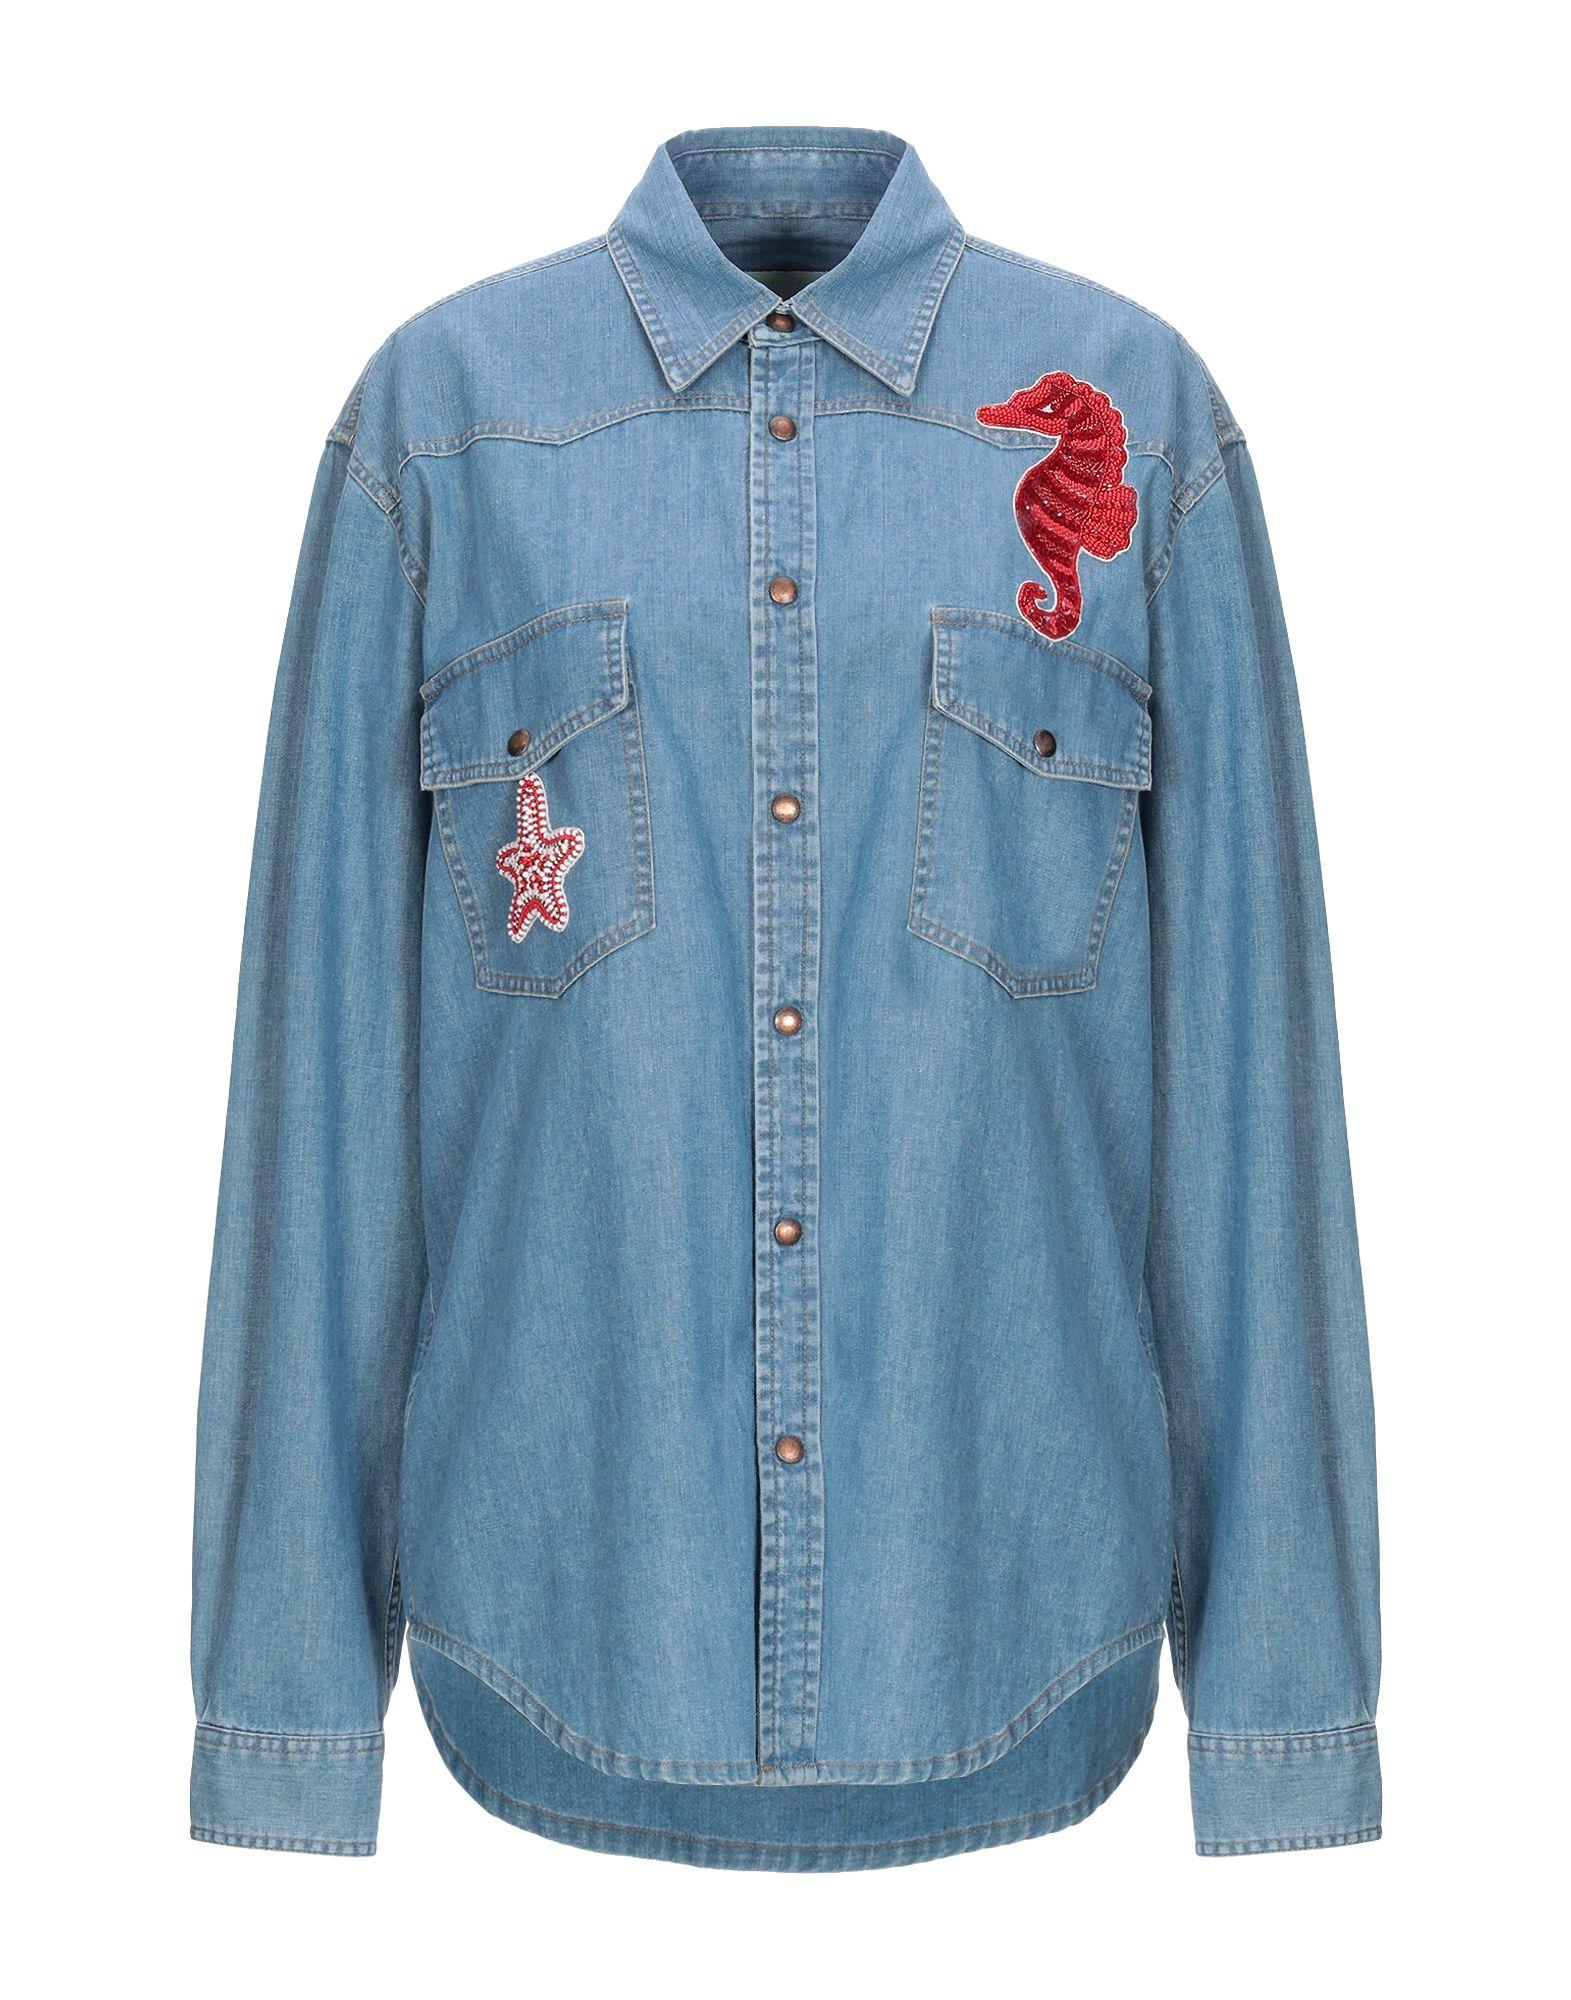 AVA ADORE Джинсовая рубашка adore delano london